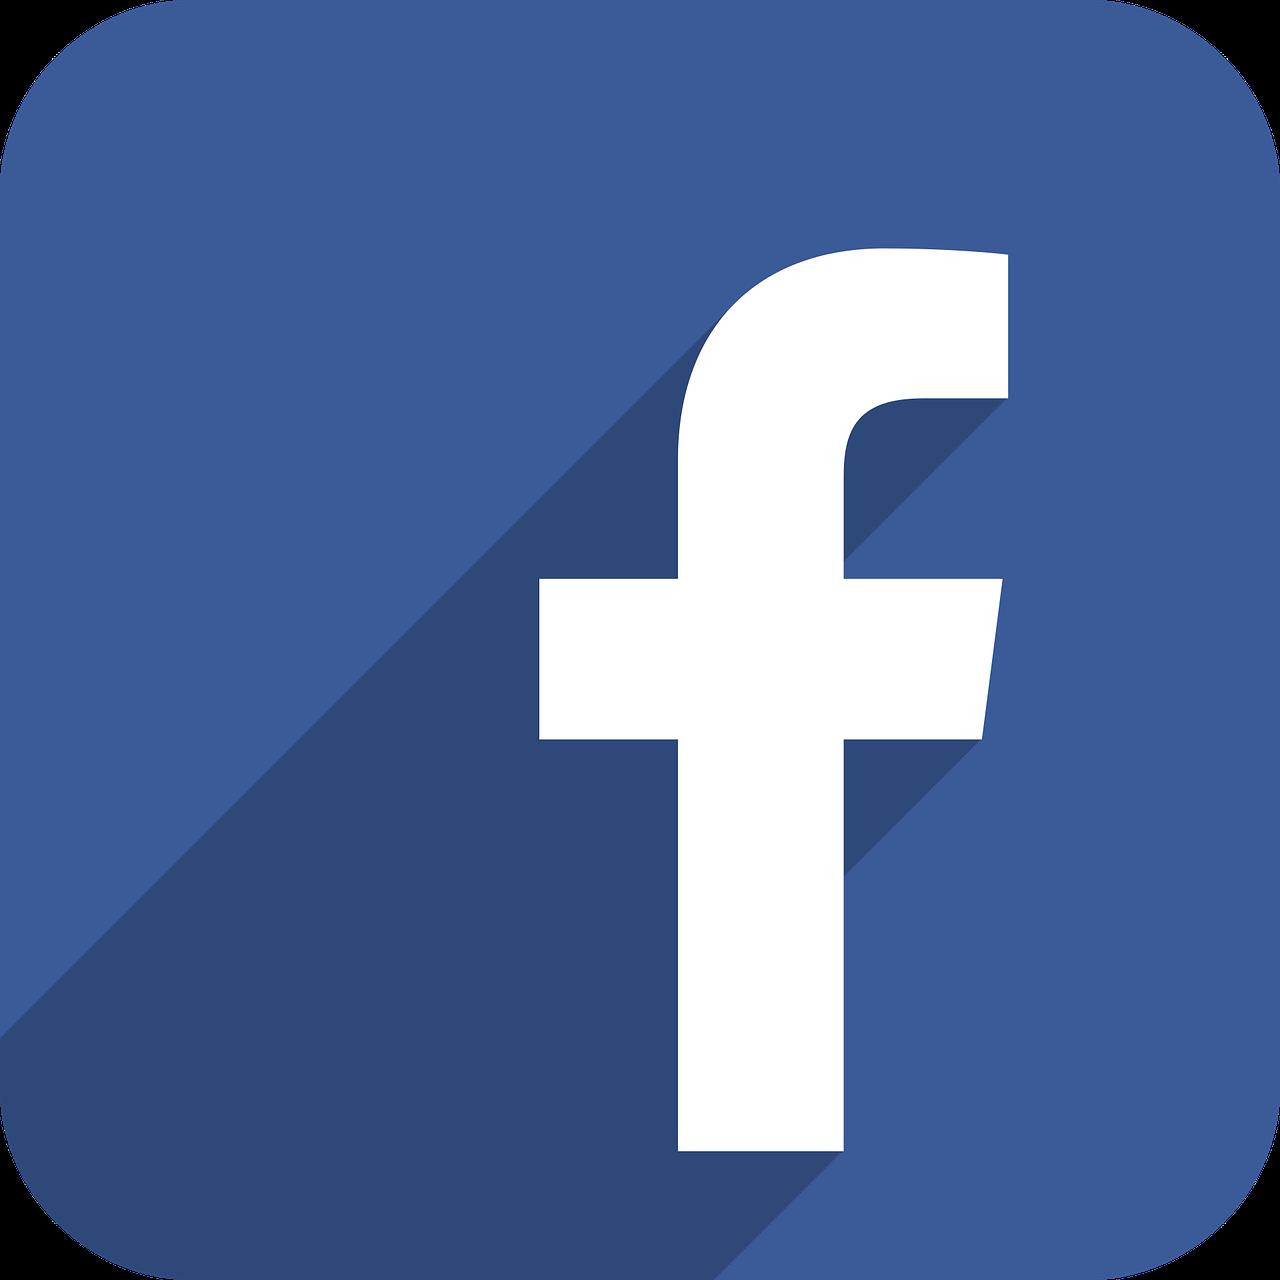 facebook-3383596_1280